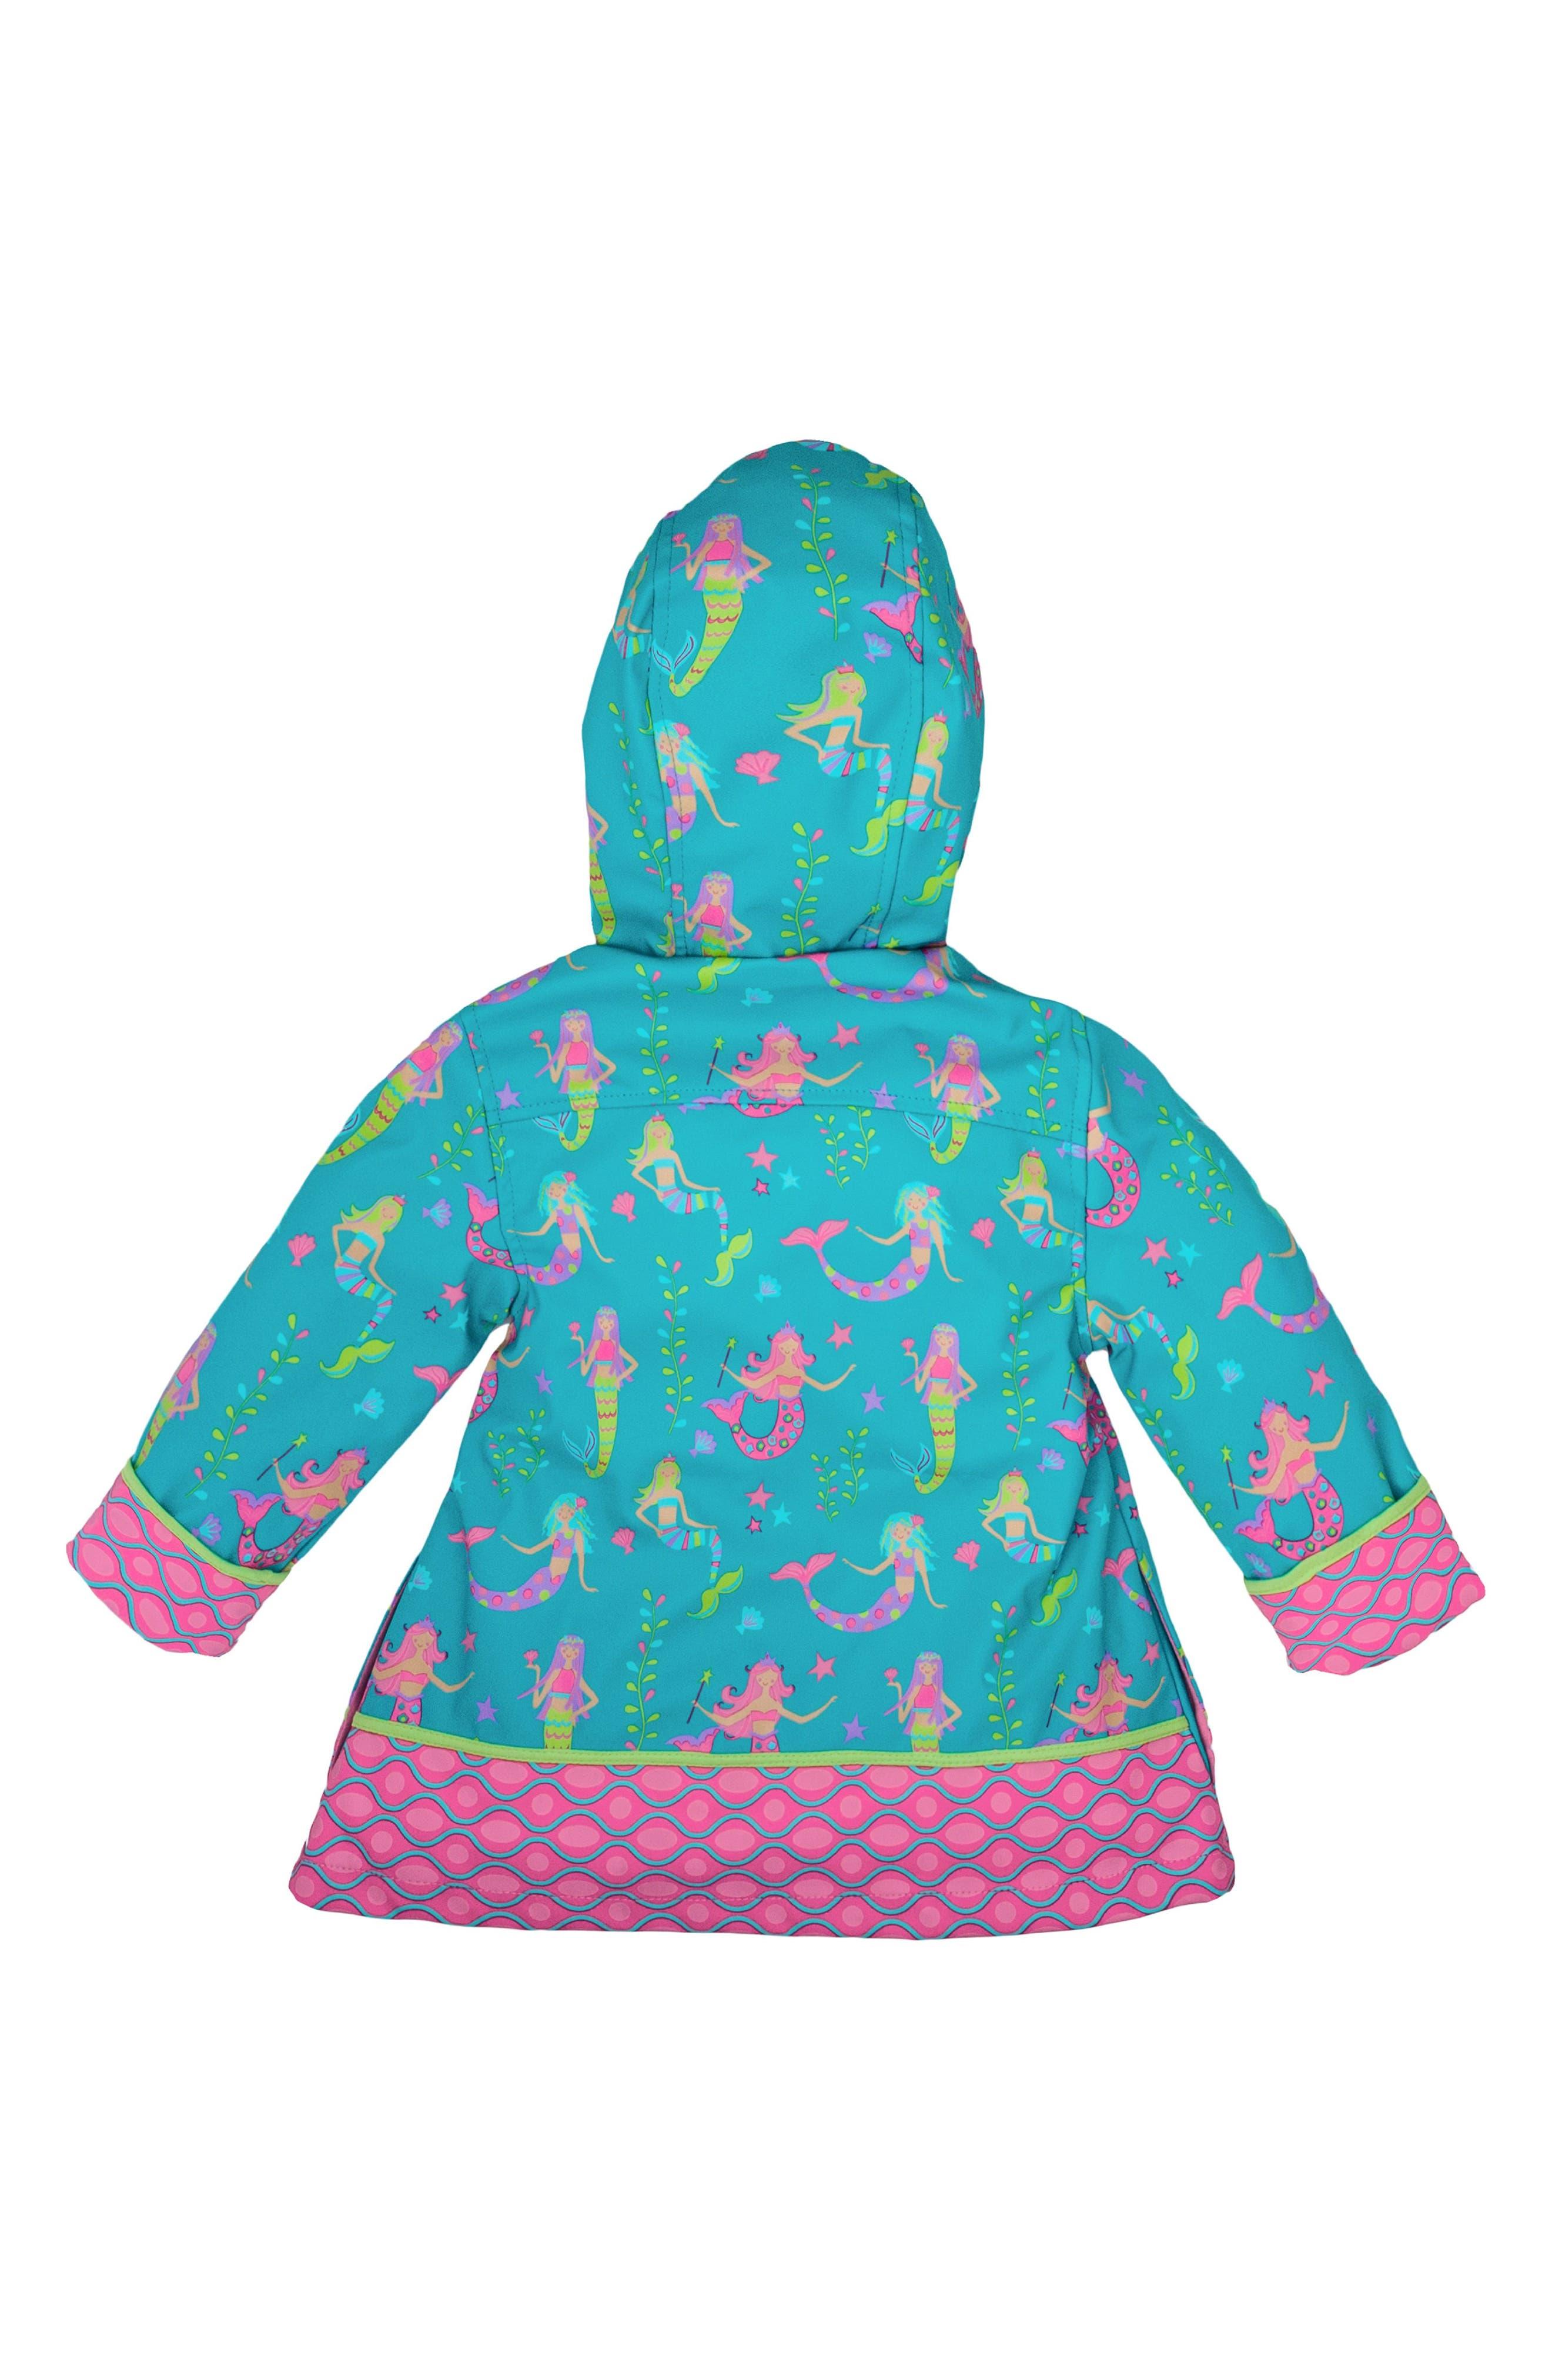 Alternate Image 3  - Stephen Joseph Mermaid Raincoat & Umbrella Set (Toddler Girls, Little Girls & Big Girls)